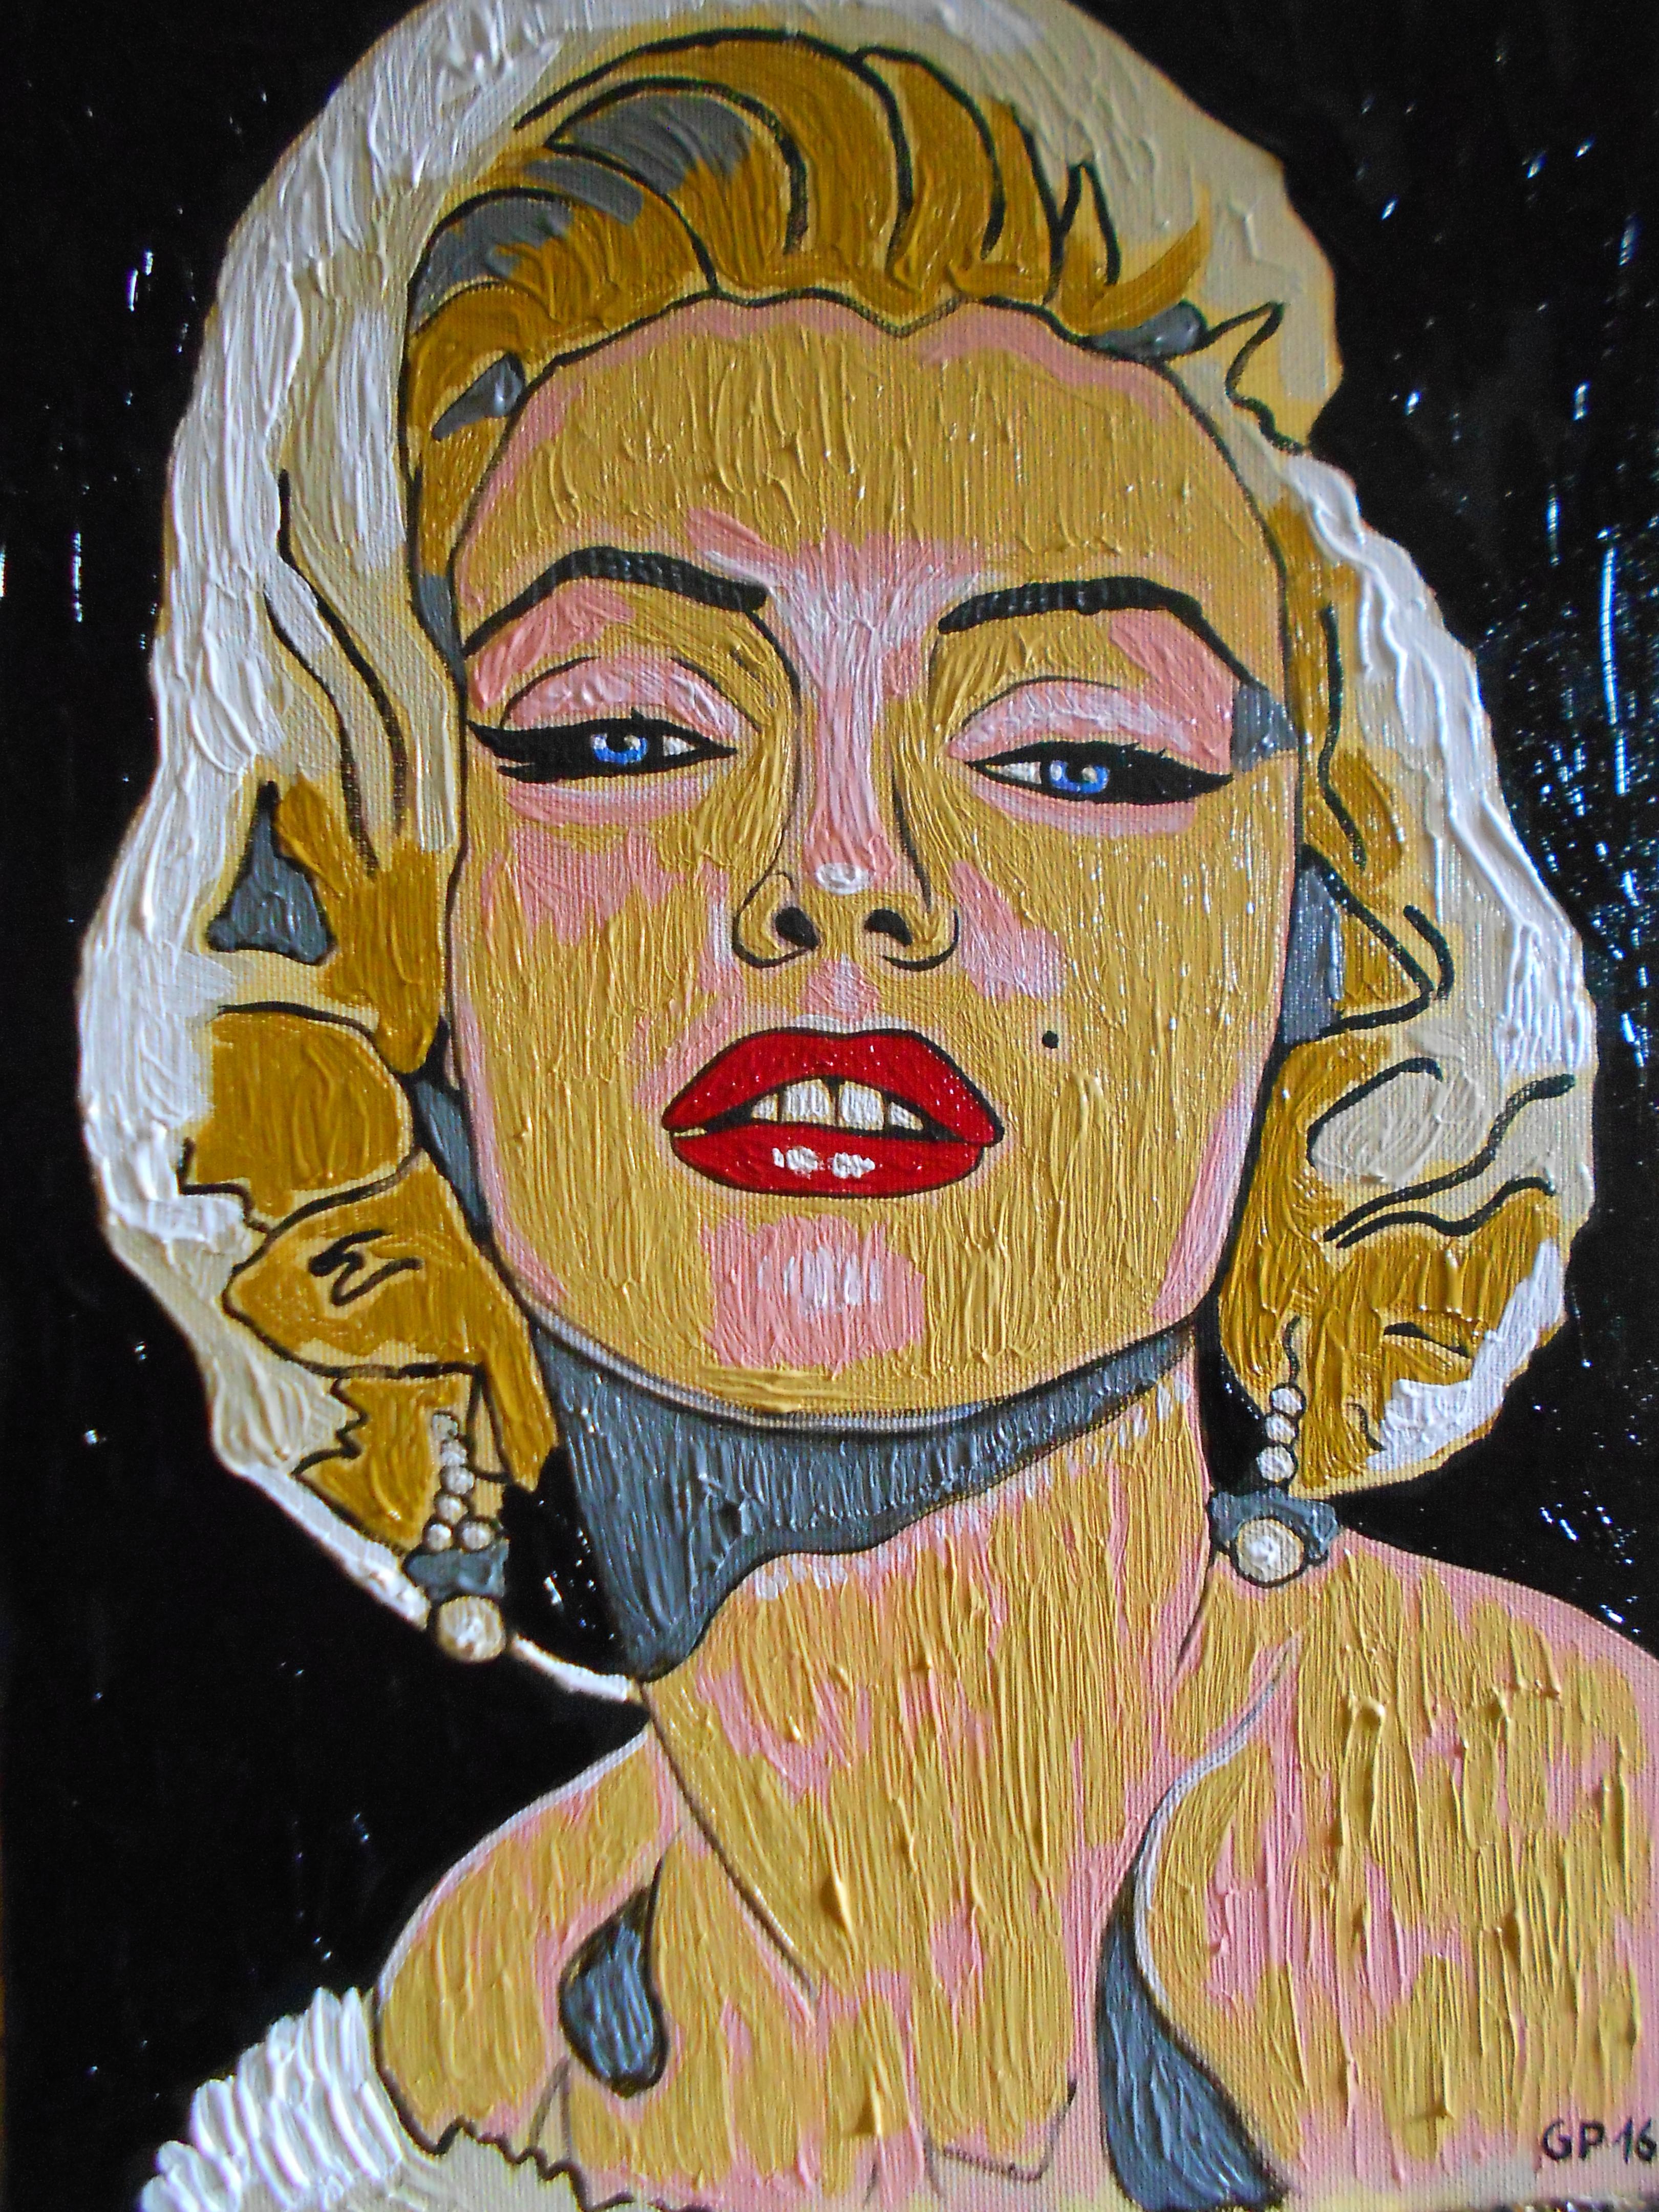 Quadri vendita online: Ritratto di marilyn monroe - MediaJob.eu ...